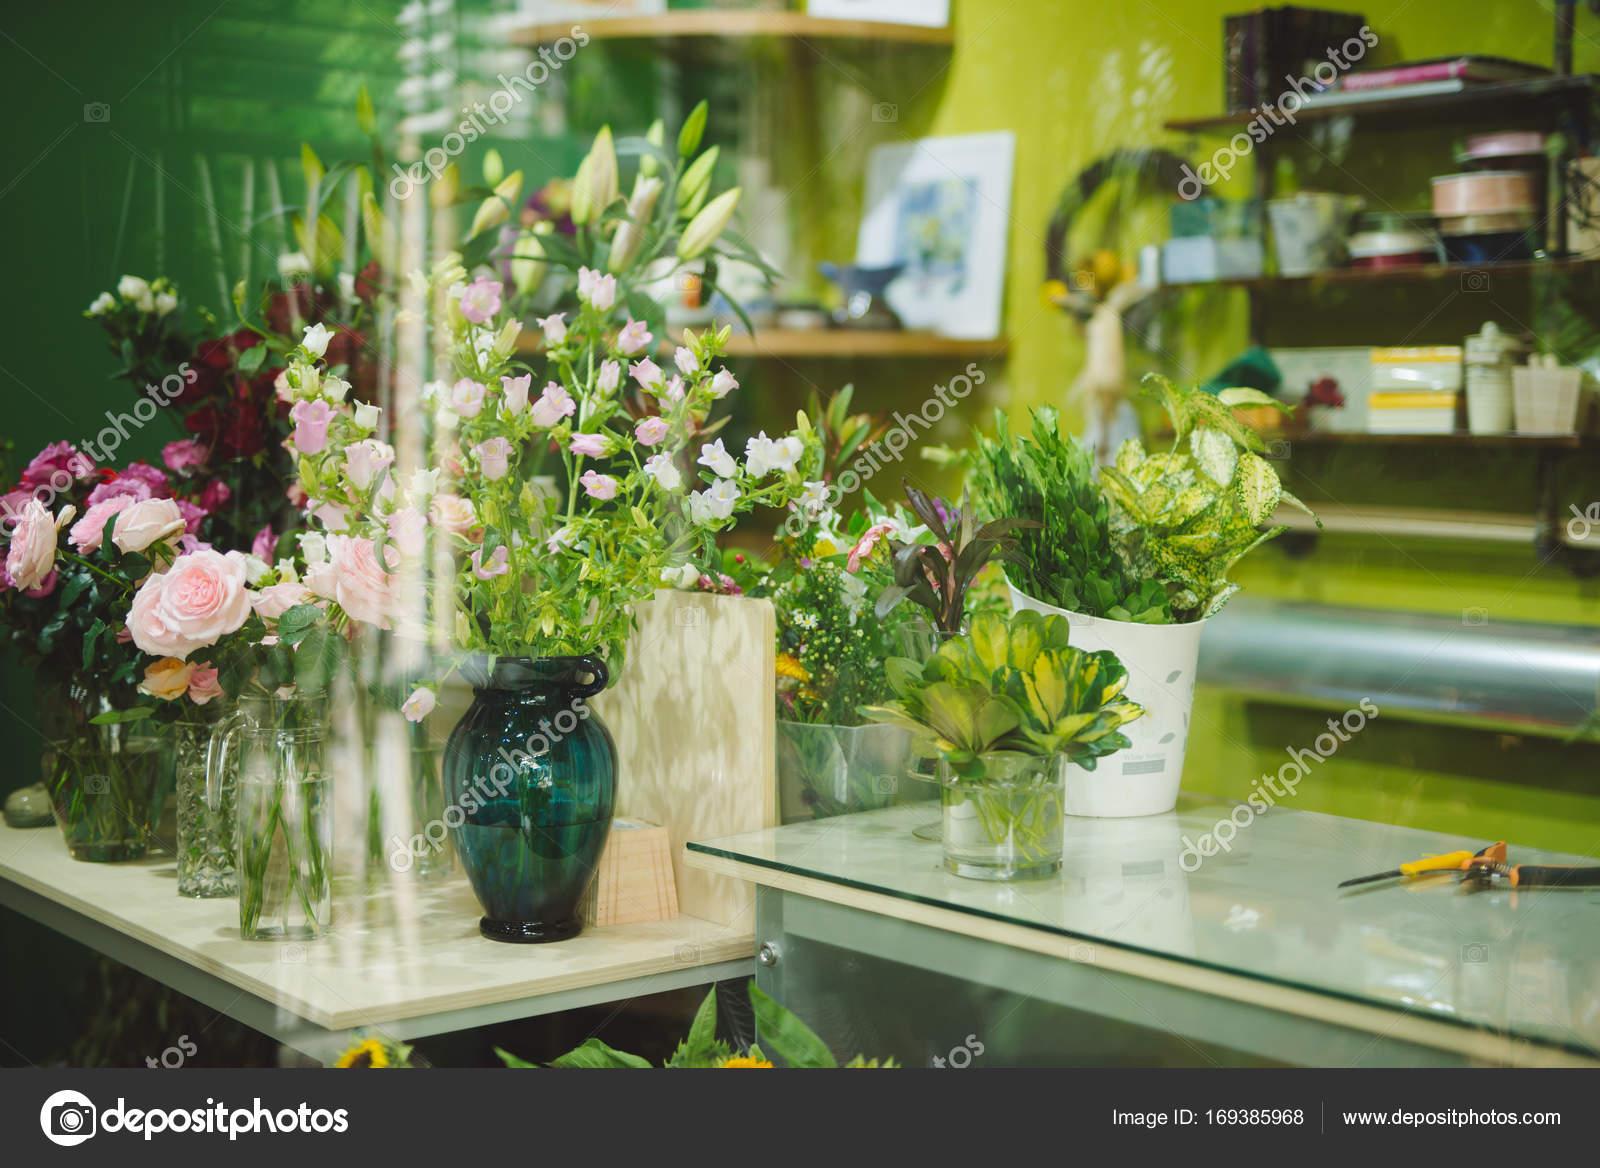 Beautiful flowers in flower shop stock photo makidotvn 169385968 beautiful flowers in flower shop stock photo izmirmasajfo